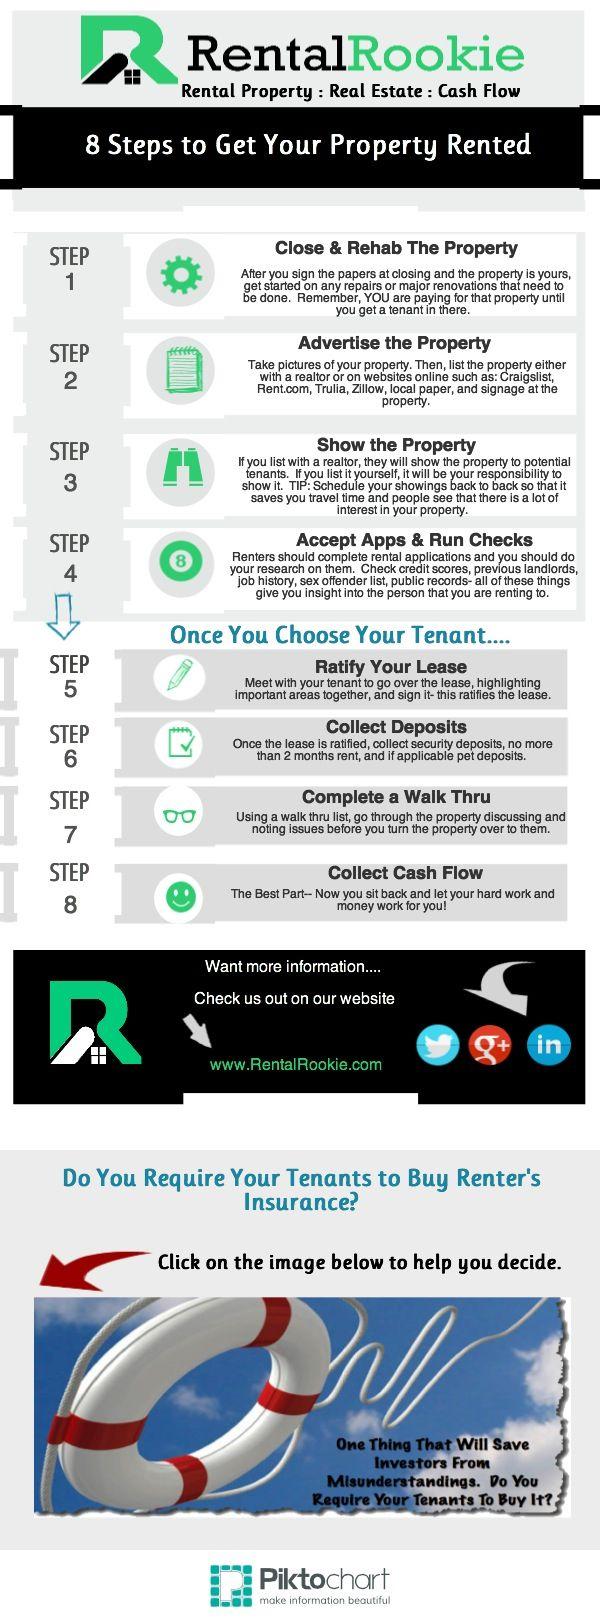 9500ebfe6d437c0e61b7f080608a7fc7 - How To Get A Rental With Bad Rental History